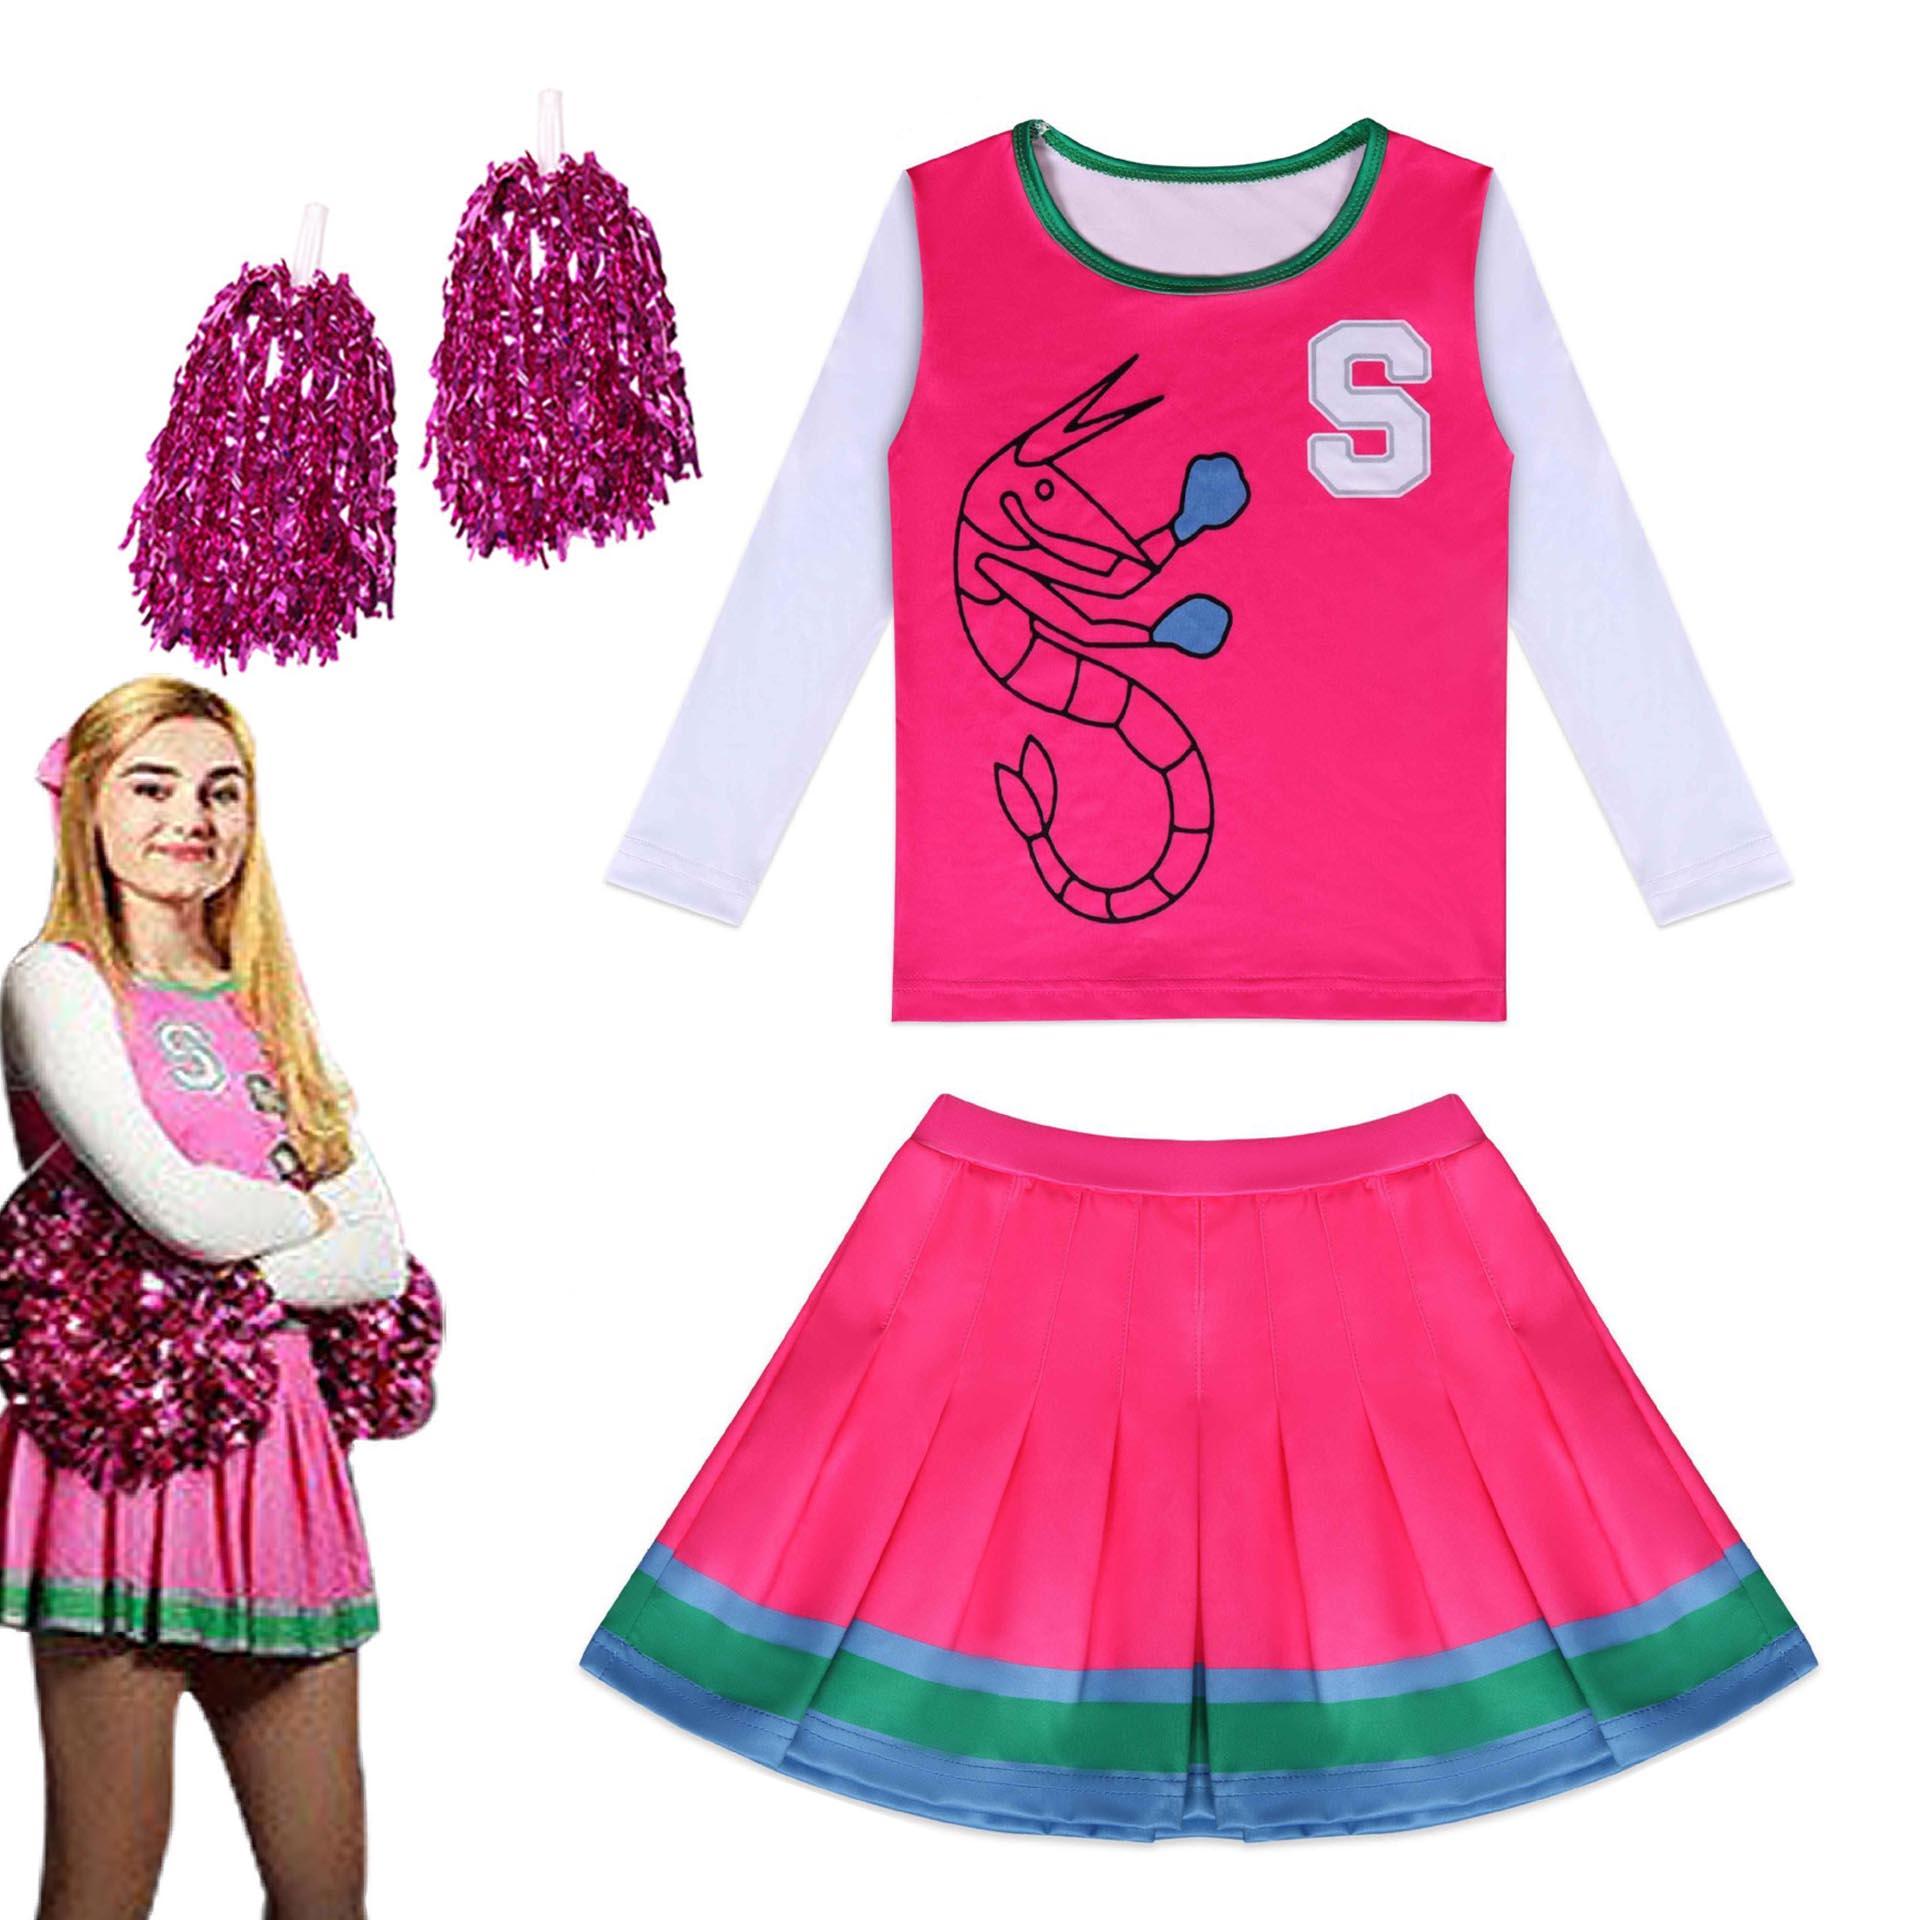 2020 meninas trajes de halloween zombies 2 addison cosplay cheerleader crianças topos + saia roupas conjunto fantasia com flor bola